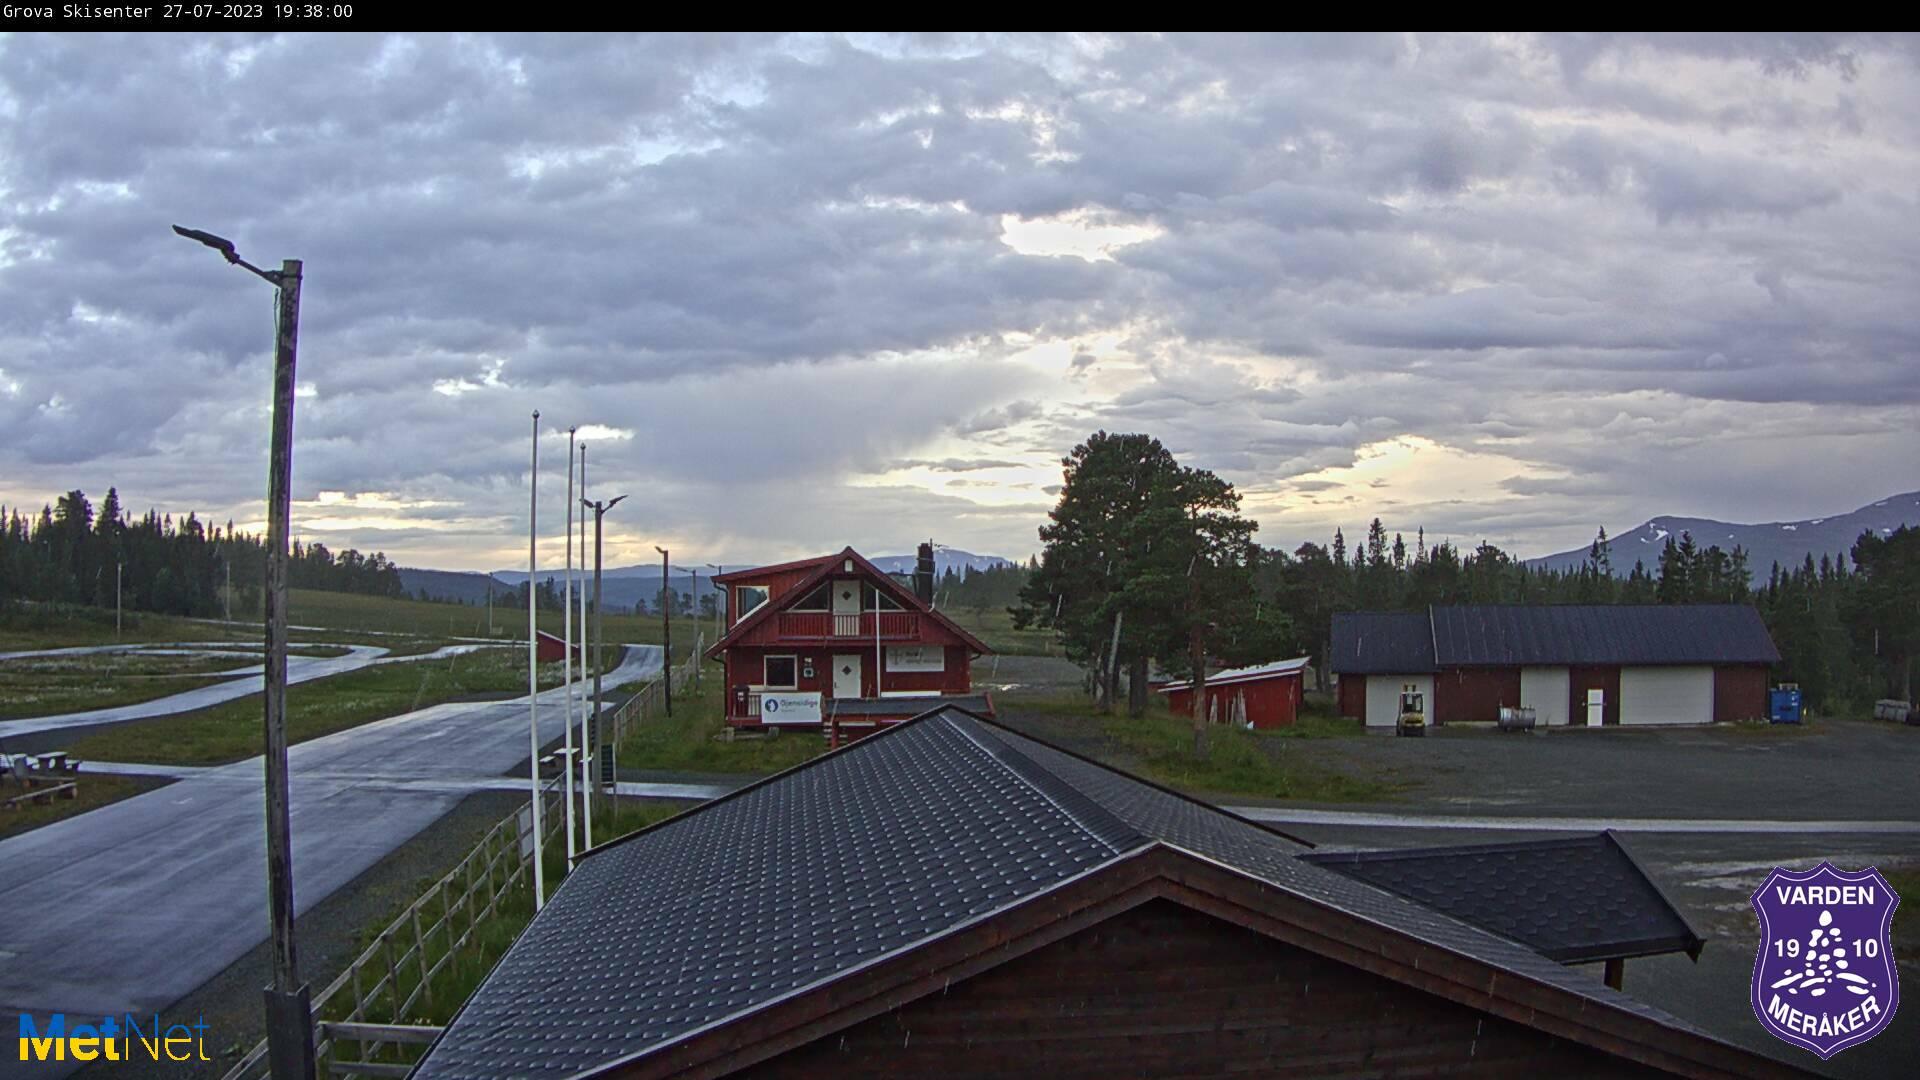 Meråker - Grova Skistadion